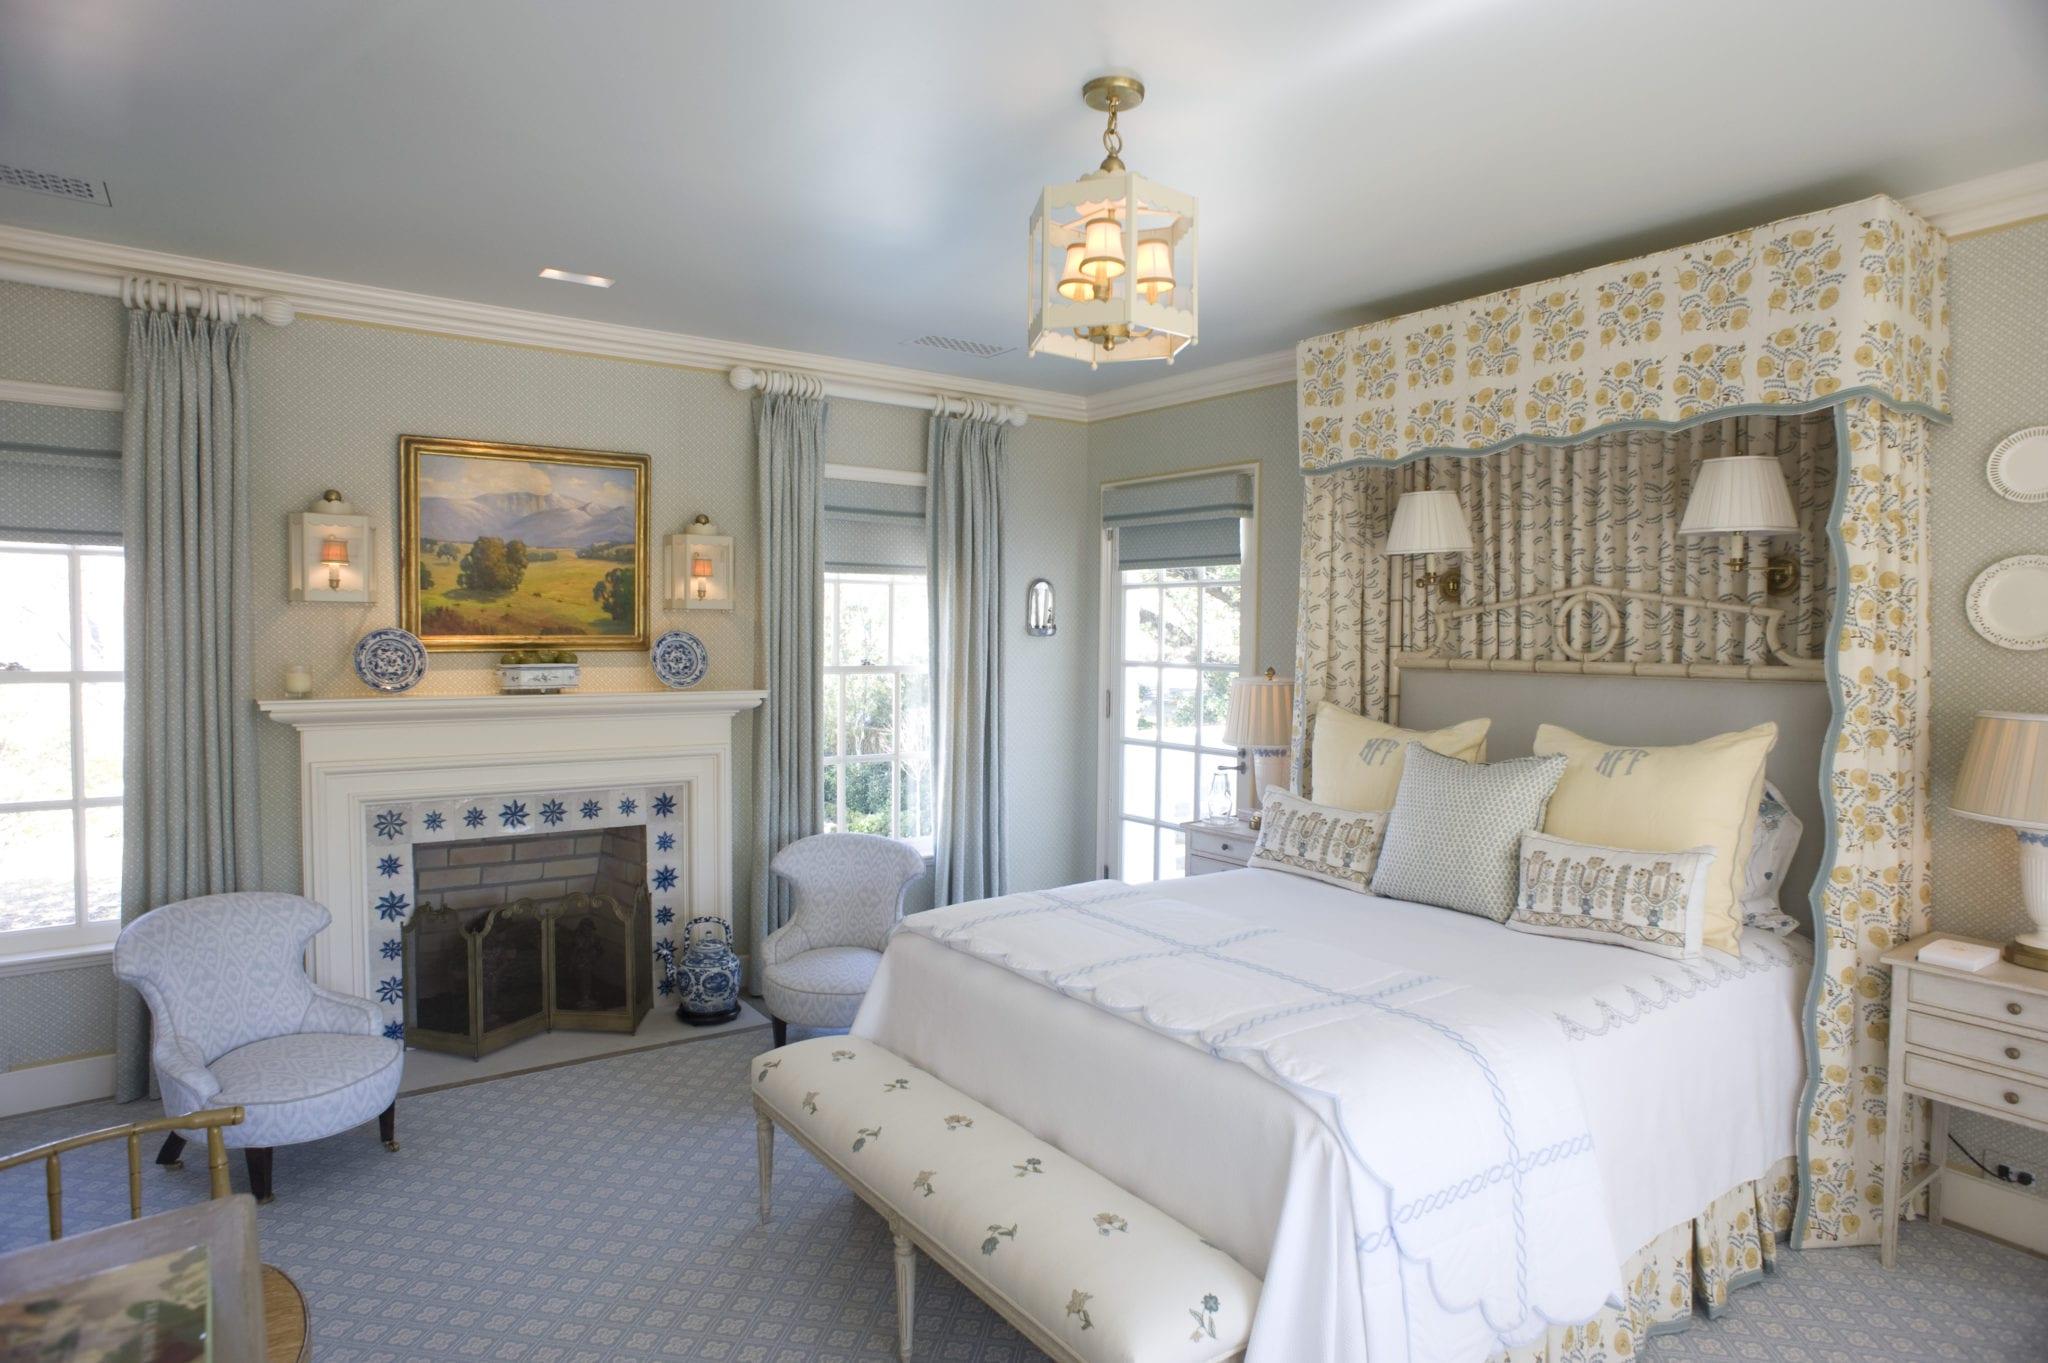 laura ashley kincaid furniture bed a stunning spanish colonial by cathy kincaid and j wilson fuqua